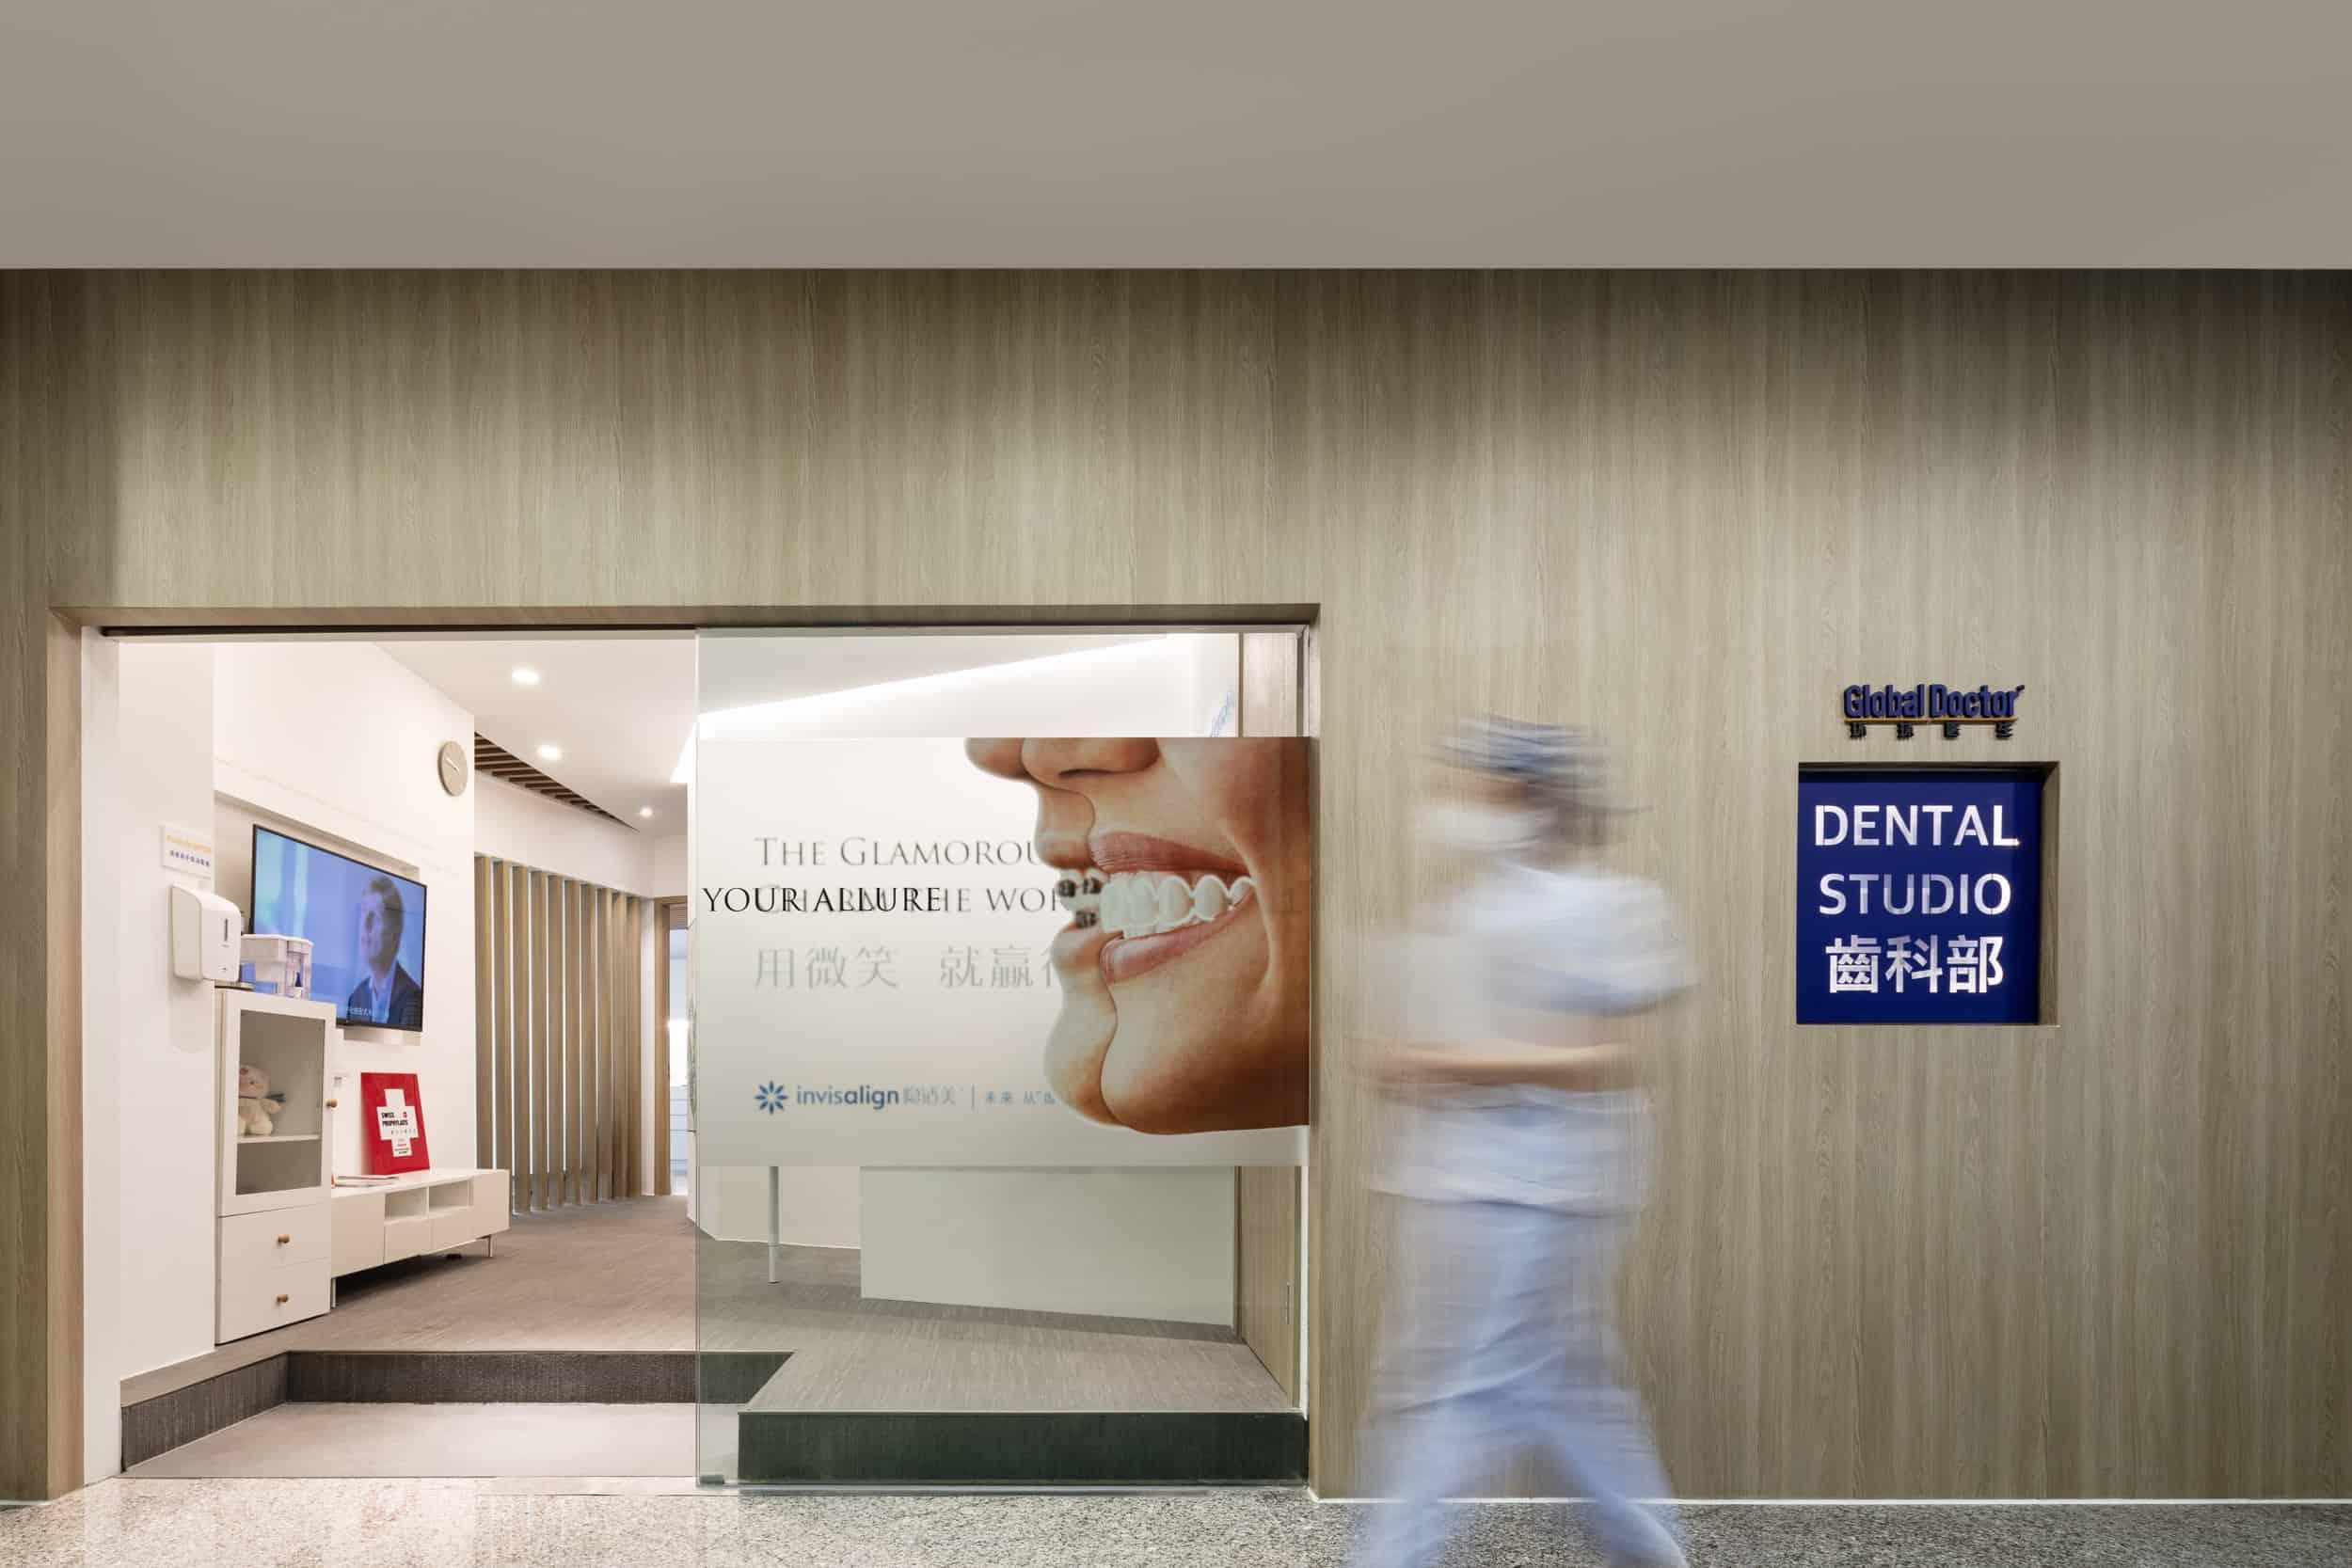 Global Doctor Dental studio chengdu expat 1